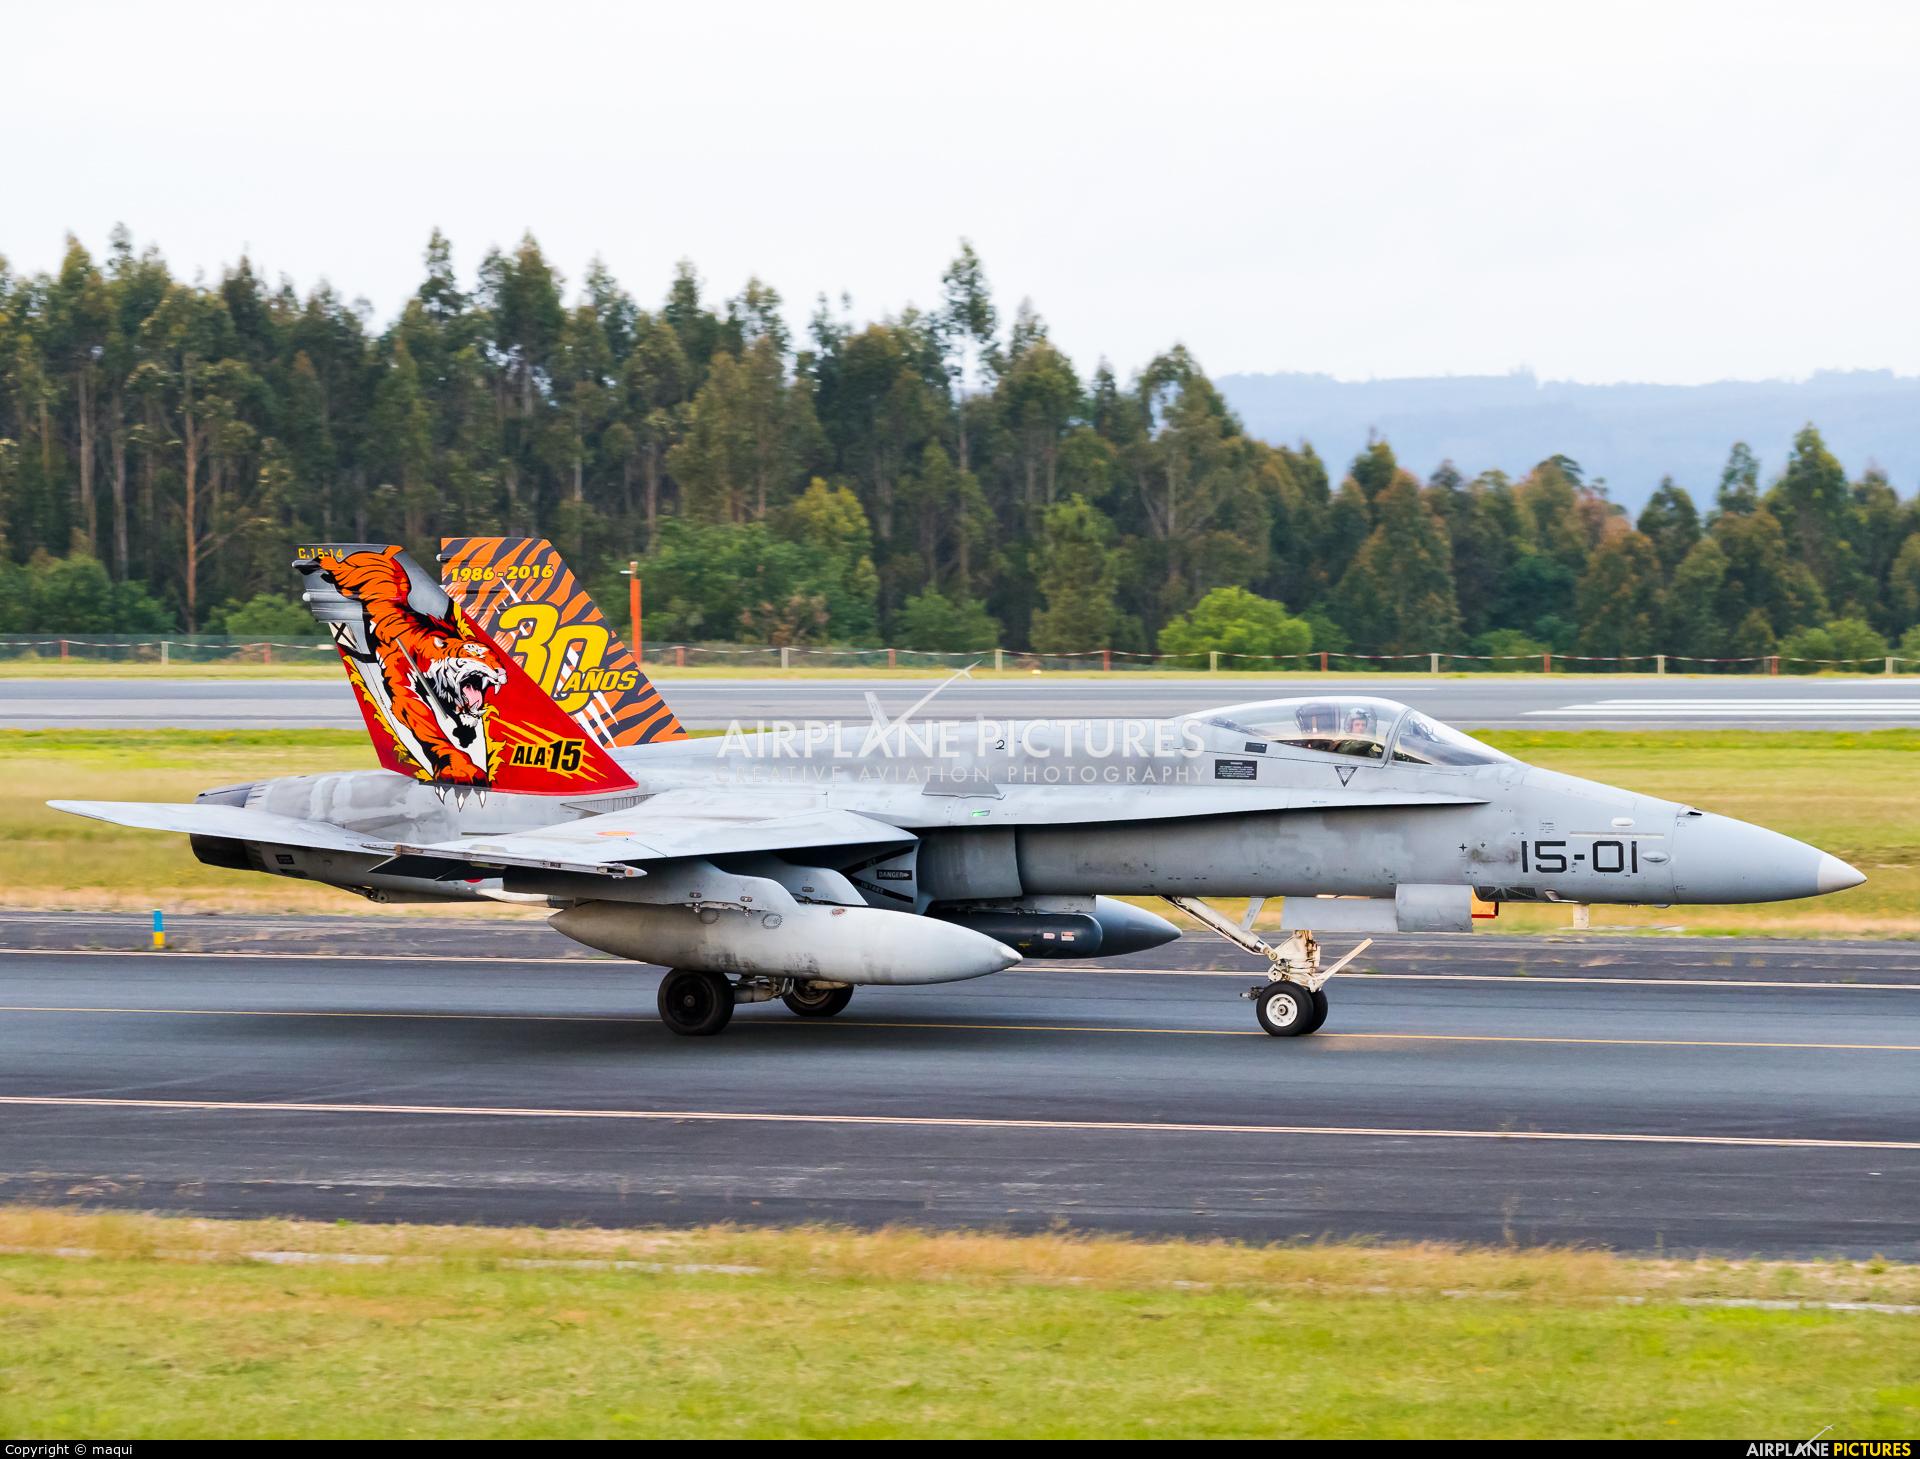 Spain - Air Force C.15-14 aircraft at Santiago de Compostela